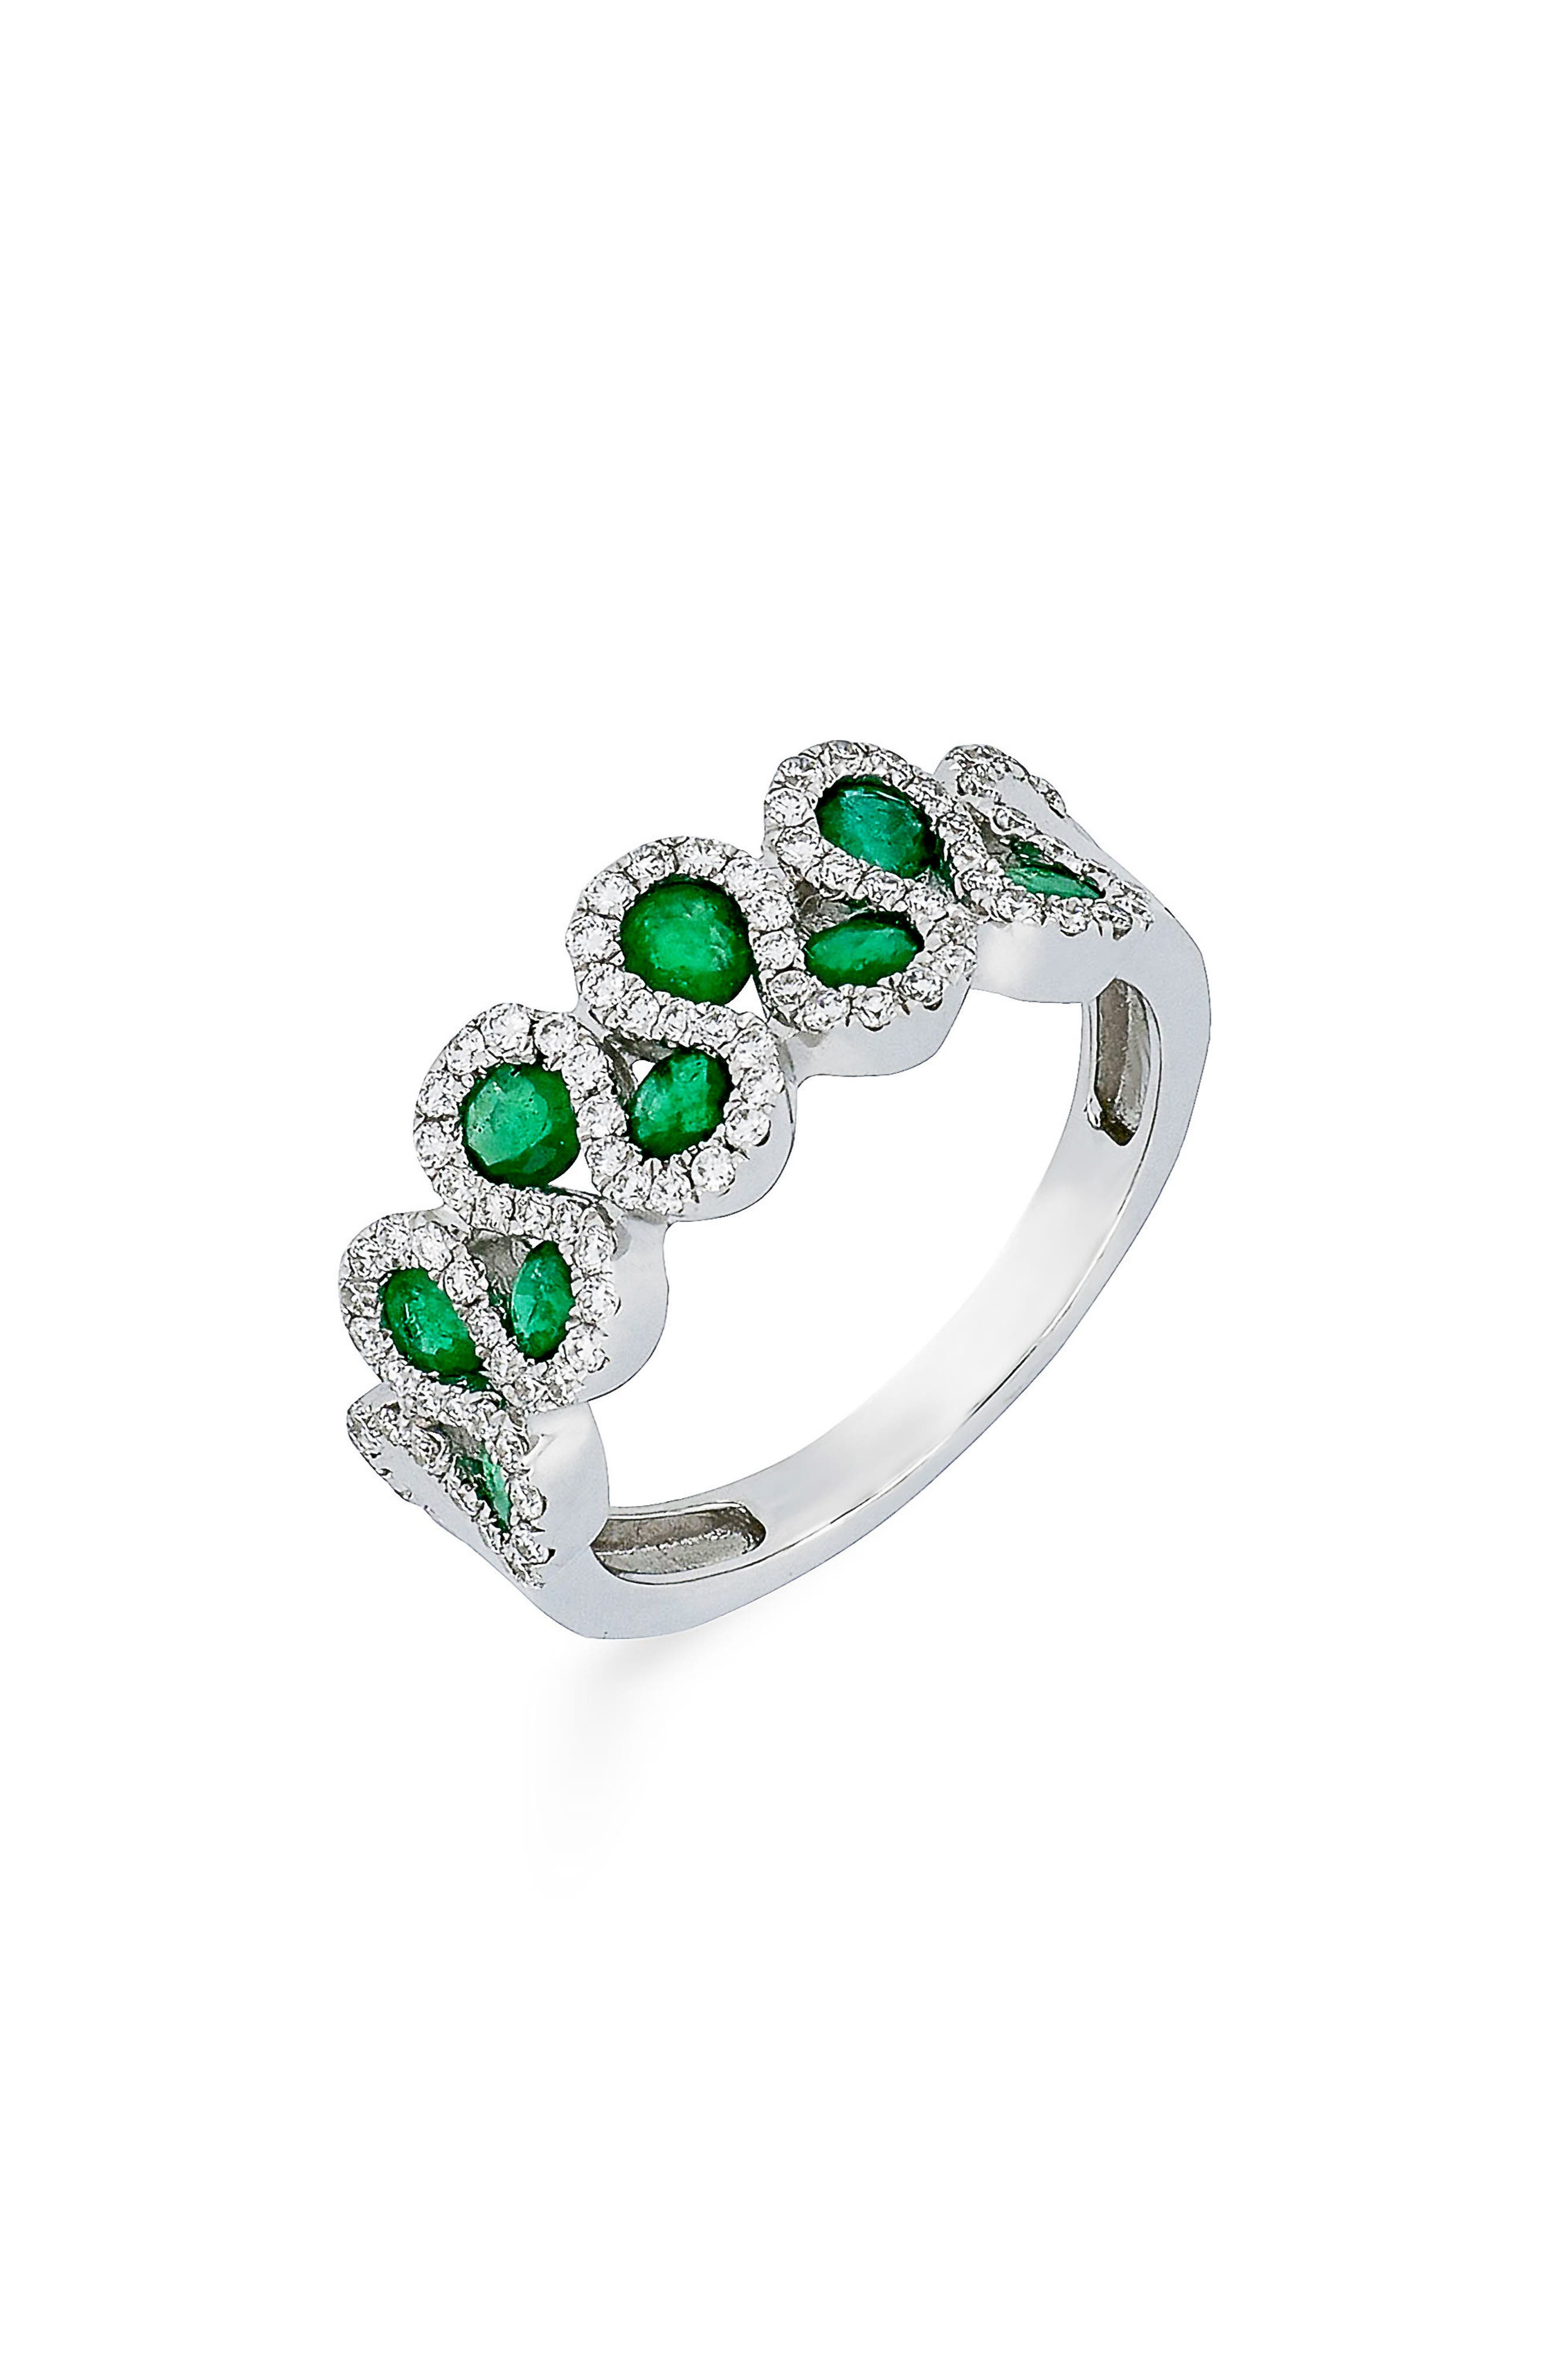 Diamond & Emerald Ring,                             Main thumbnail 1, color,                             White Gold